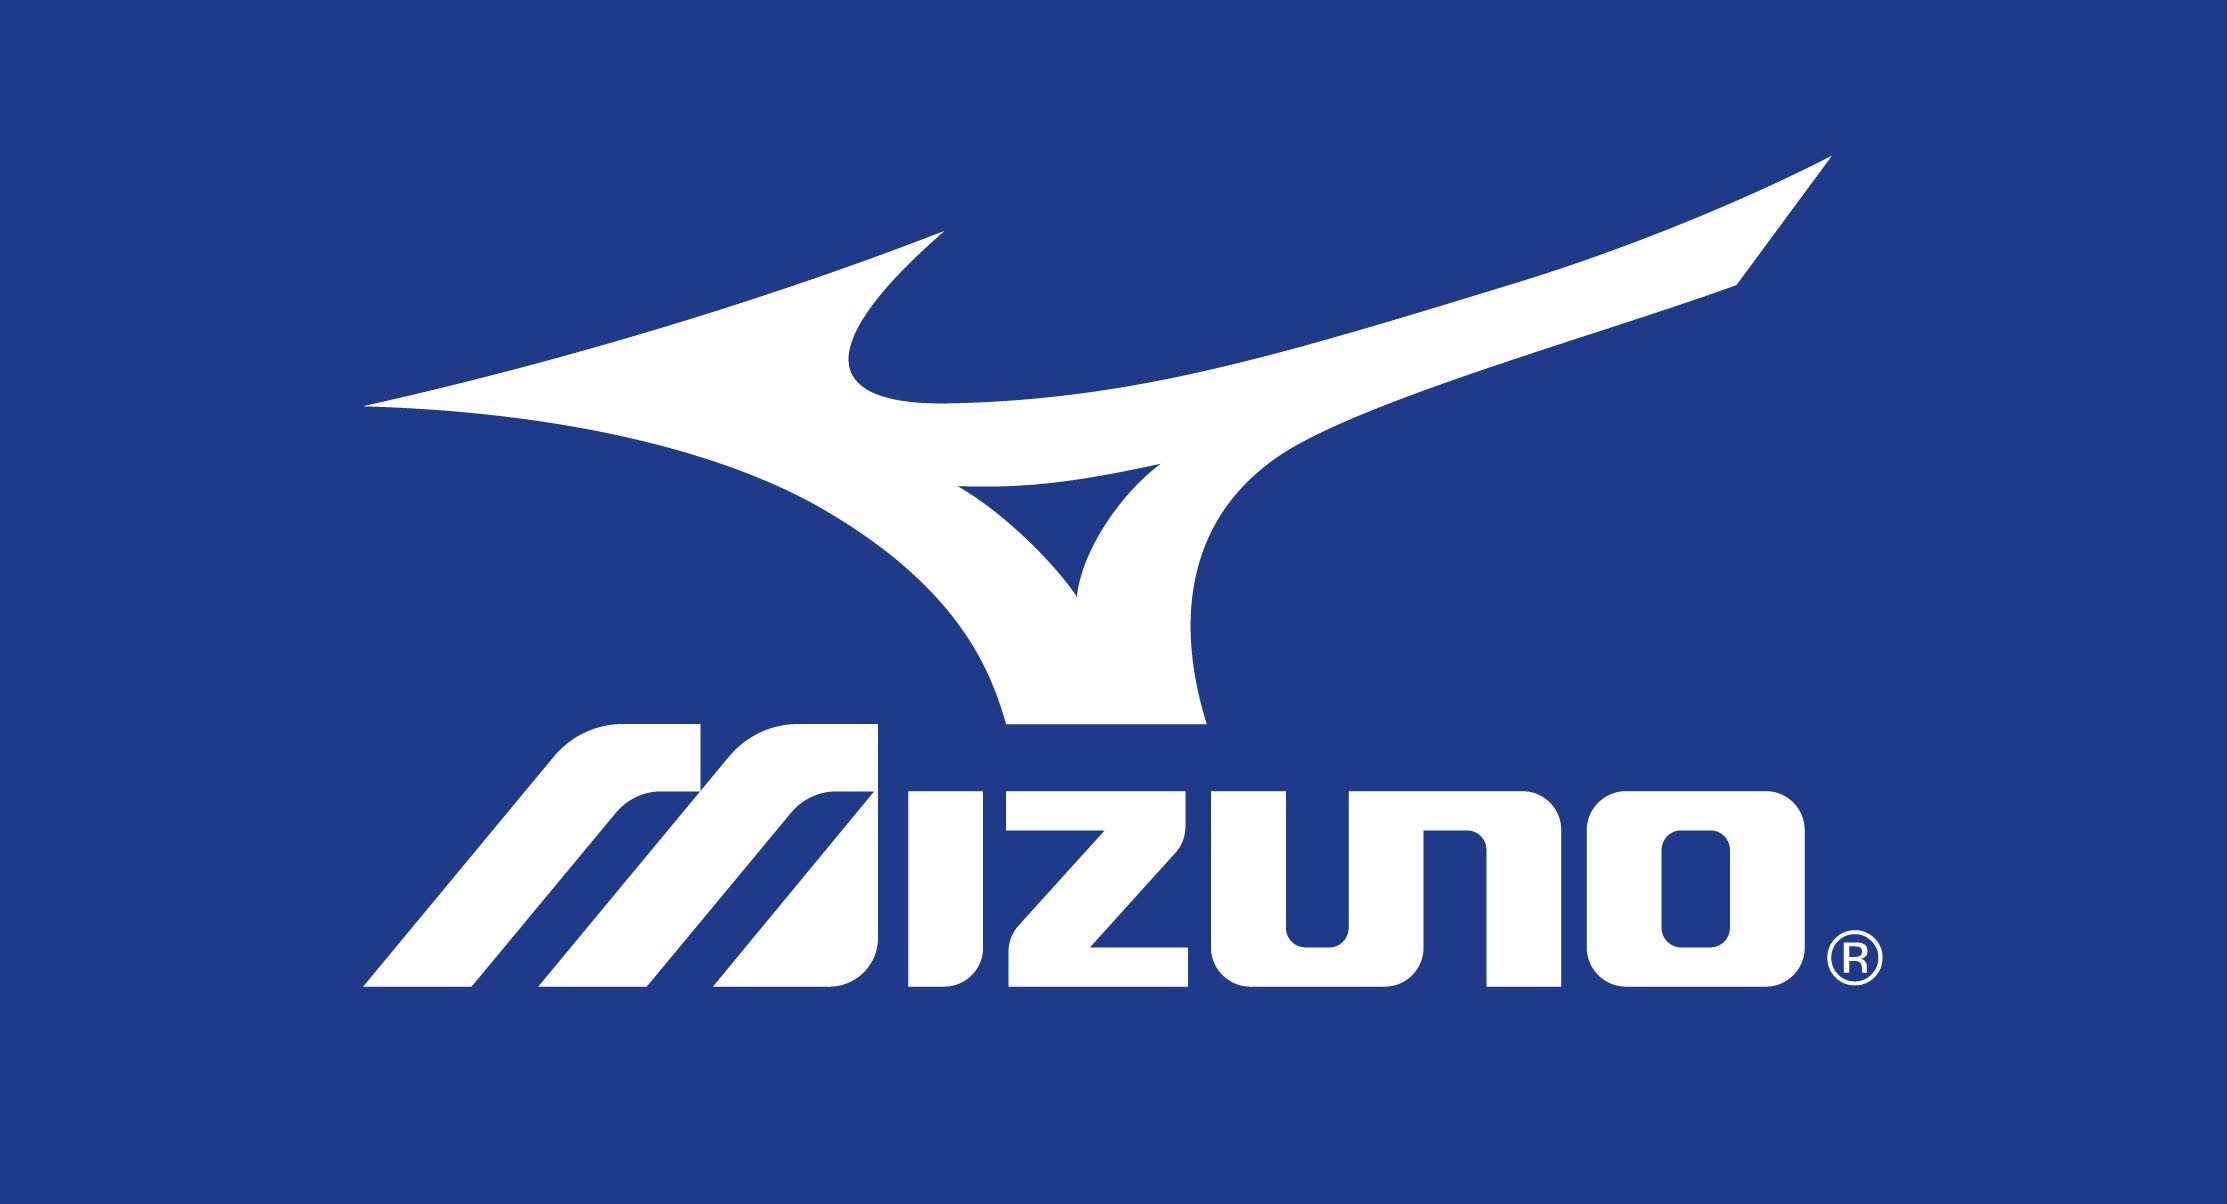 https://www.mizunousa.com/